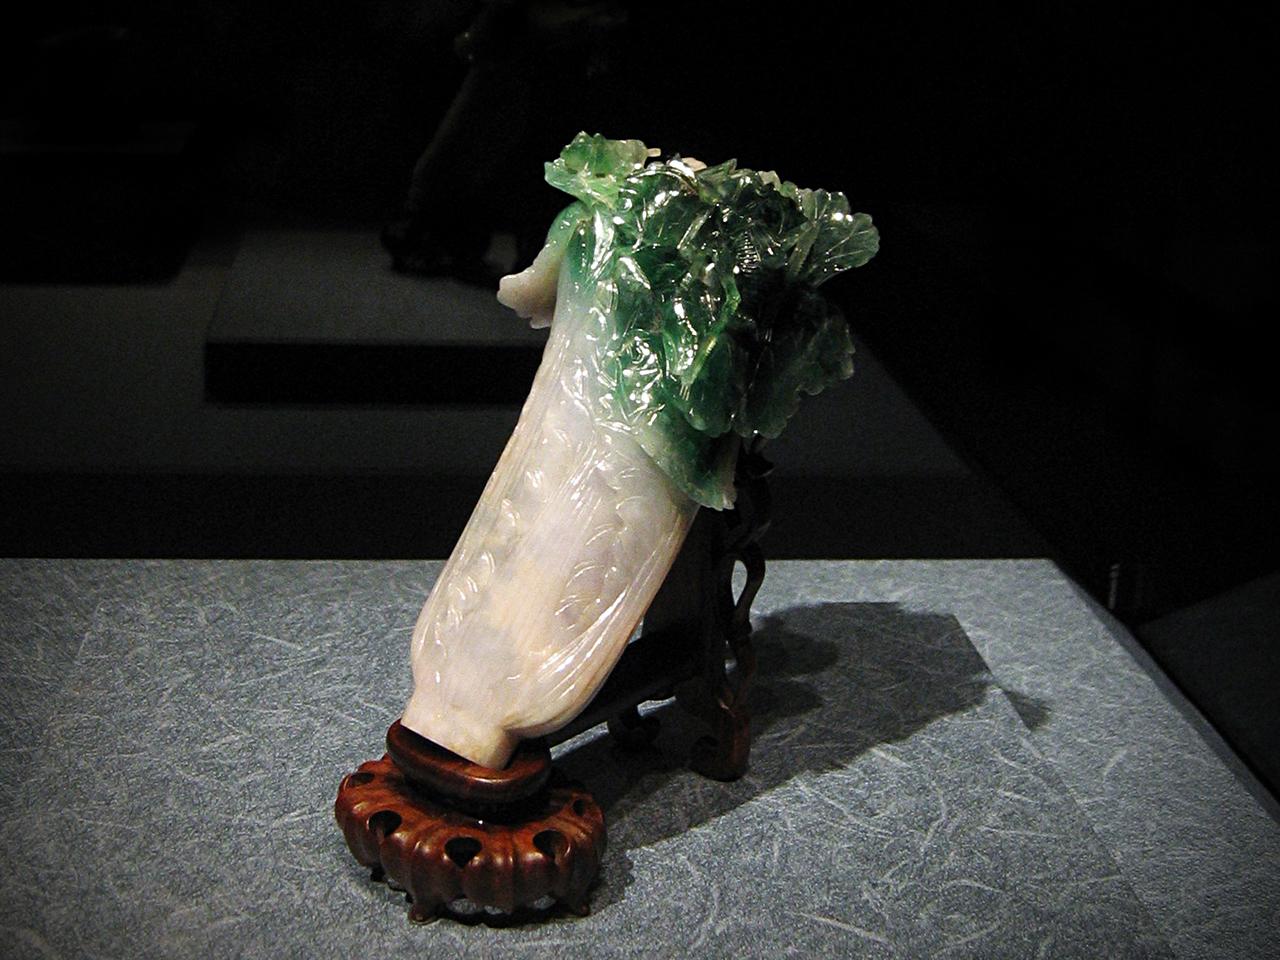 Image of Brassica rapa ssp. pekinensis